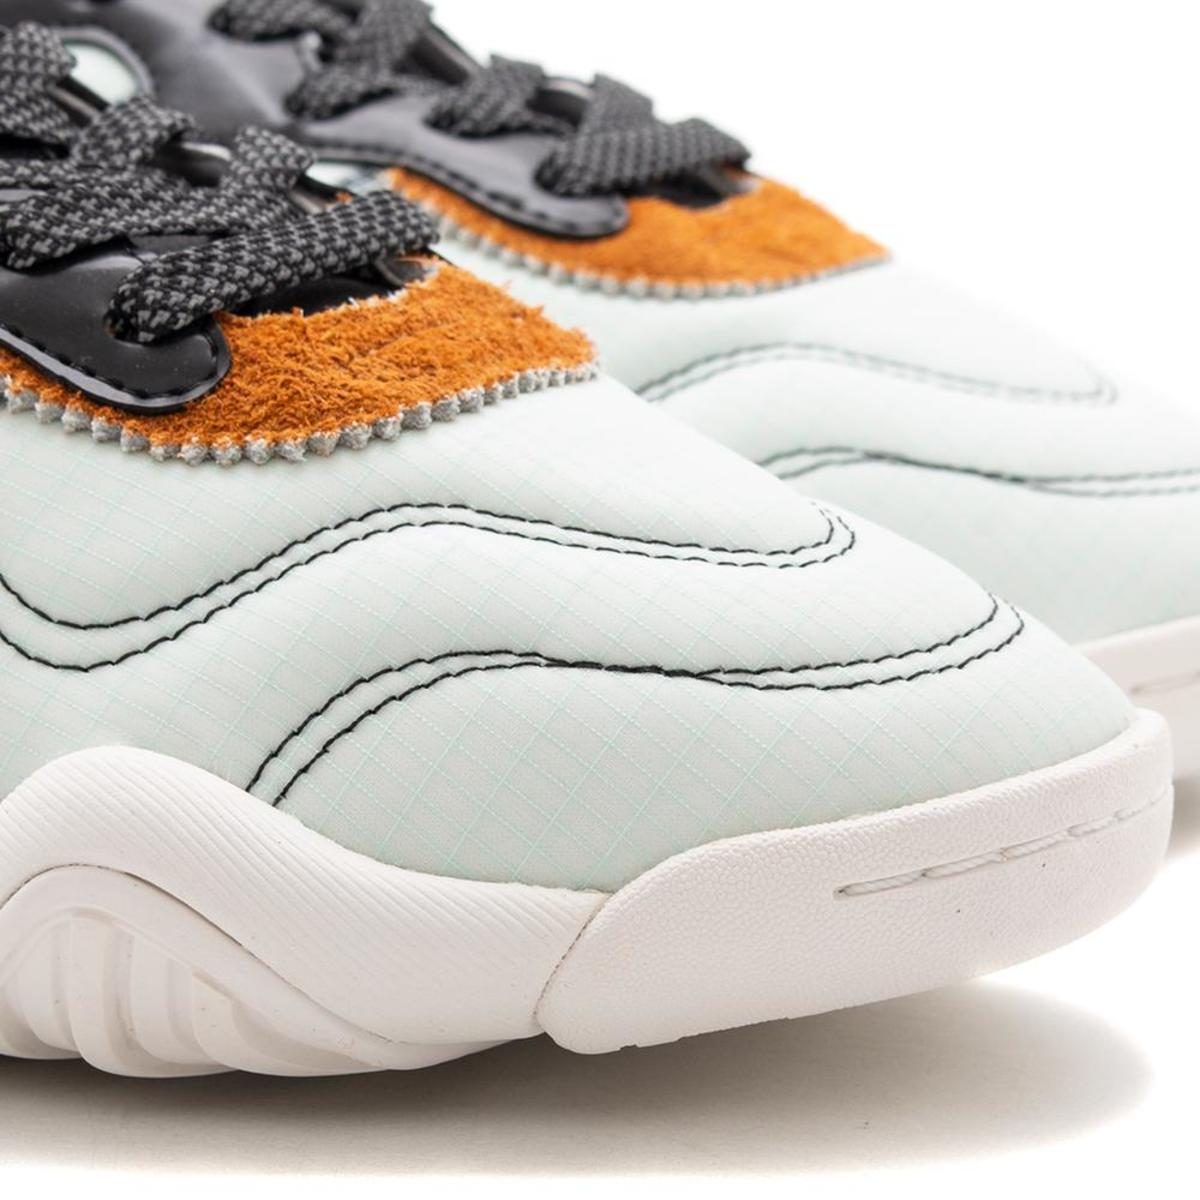 17cdb6b2305 adidas Originals by Alexander Wang AW Turnout Trainer - Clear Mint ...